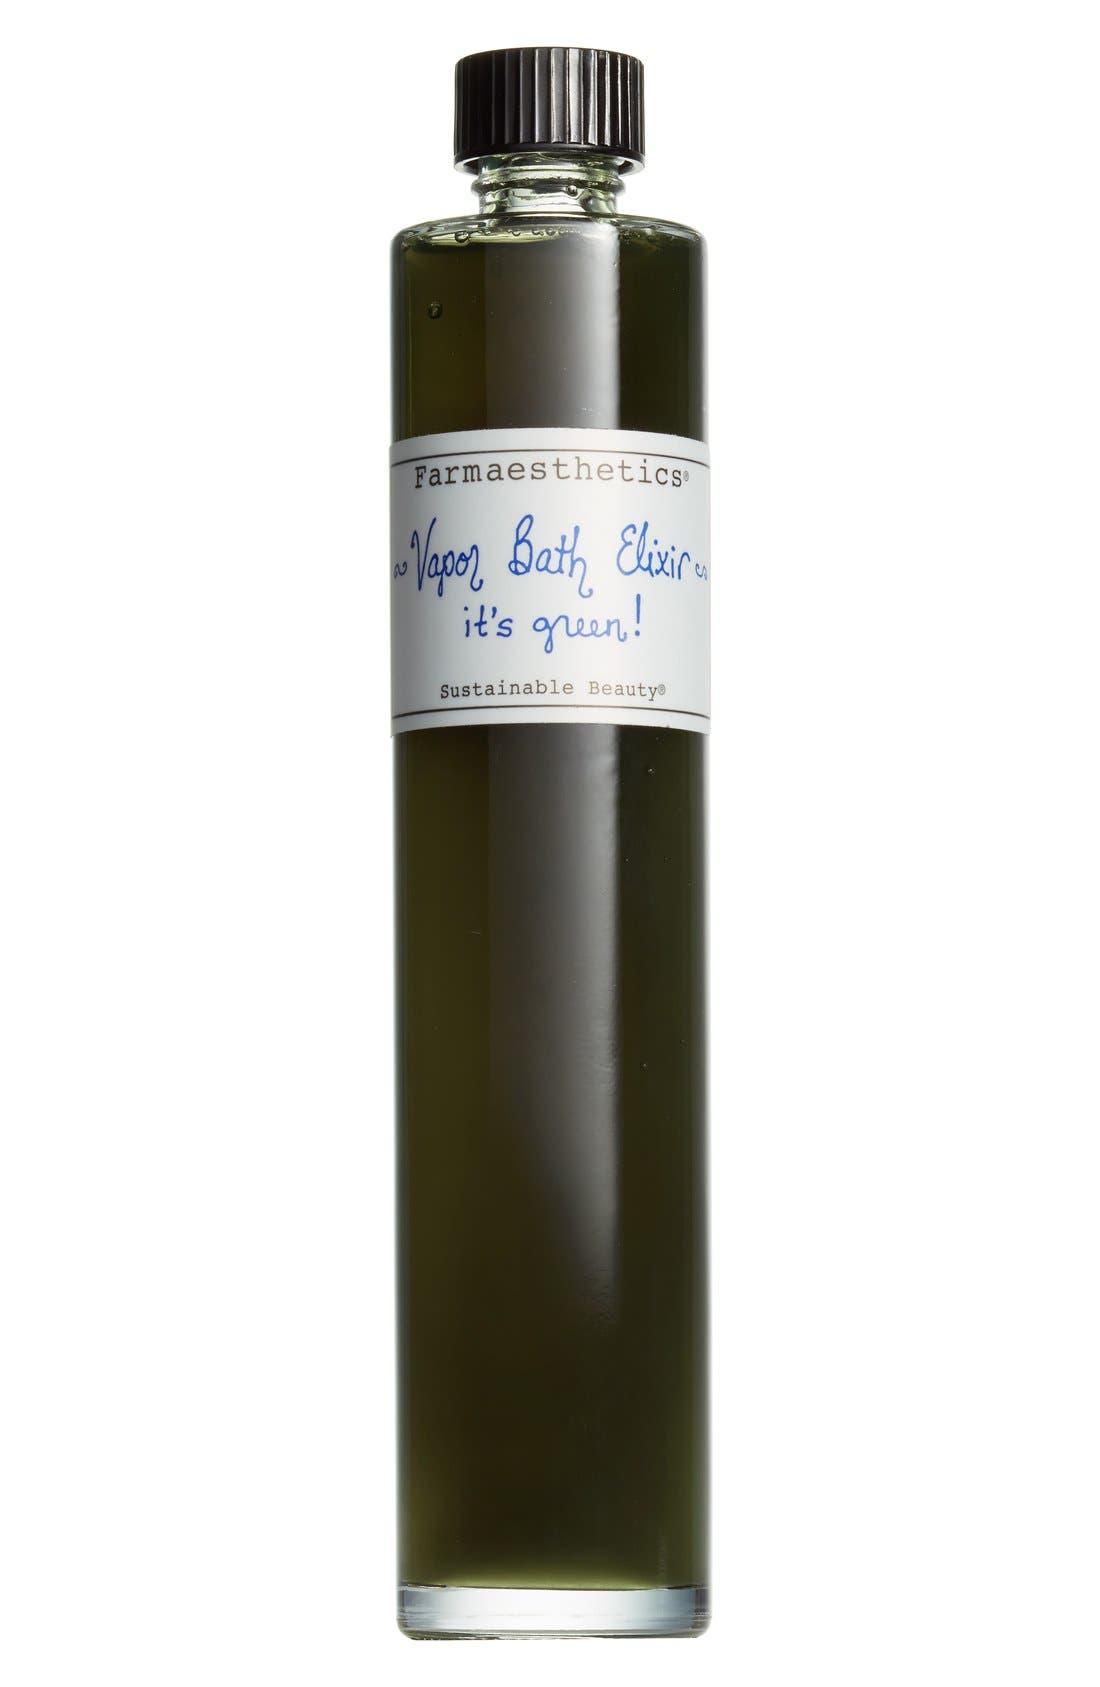 Farmaesthetics Vapor Bath Elixir